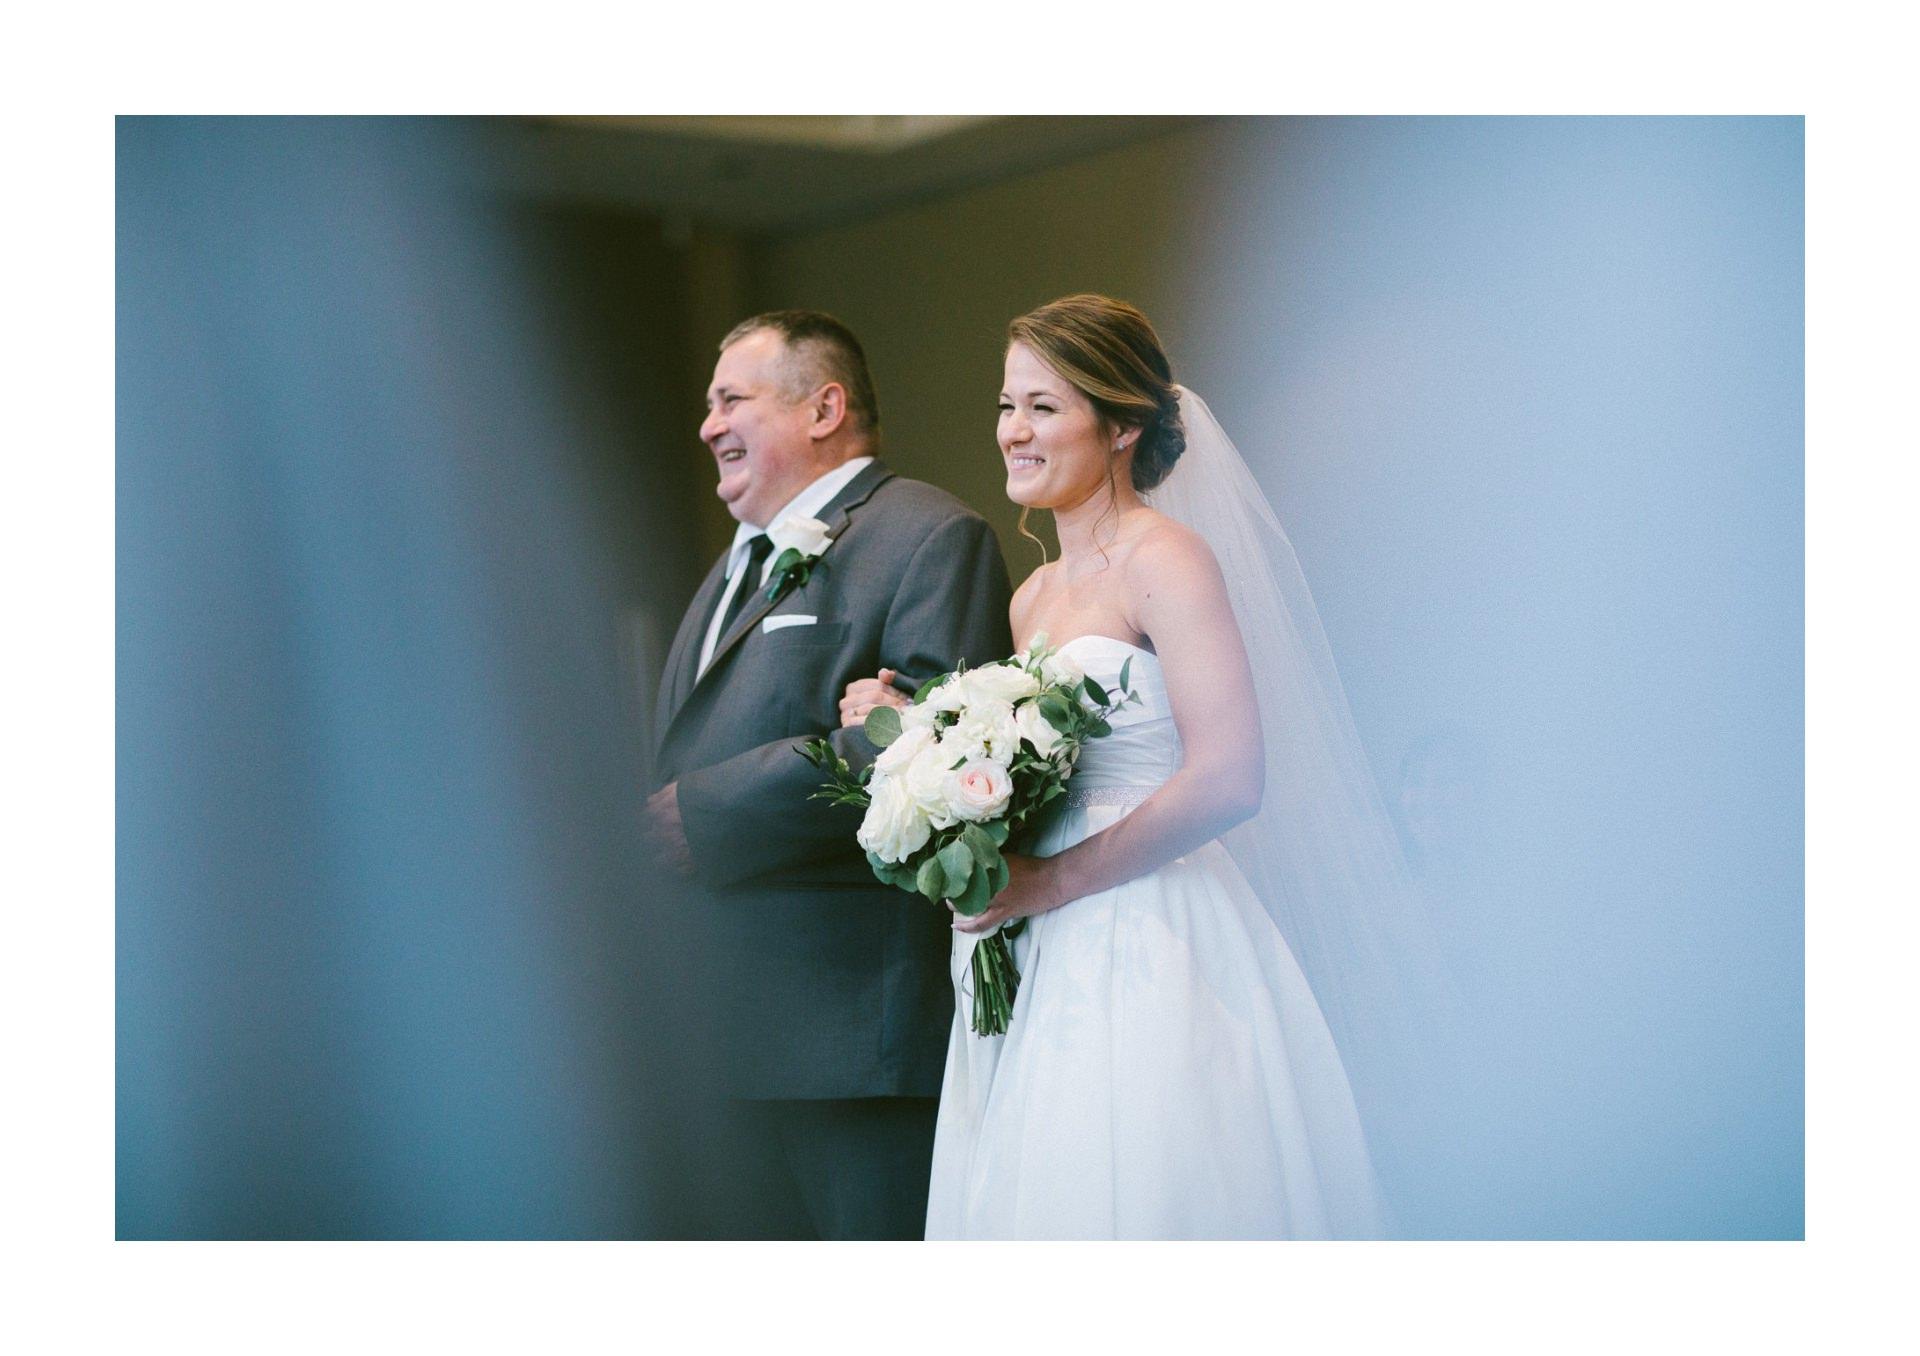 Dowtown Hilton Cleveland Wedding Photographer 2 10.jpg